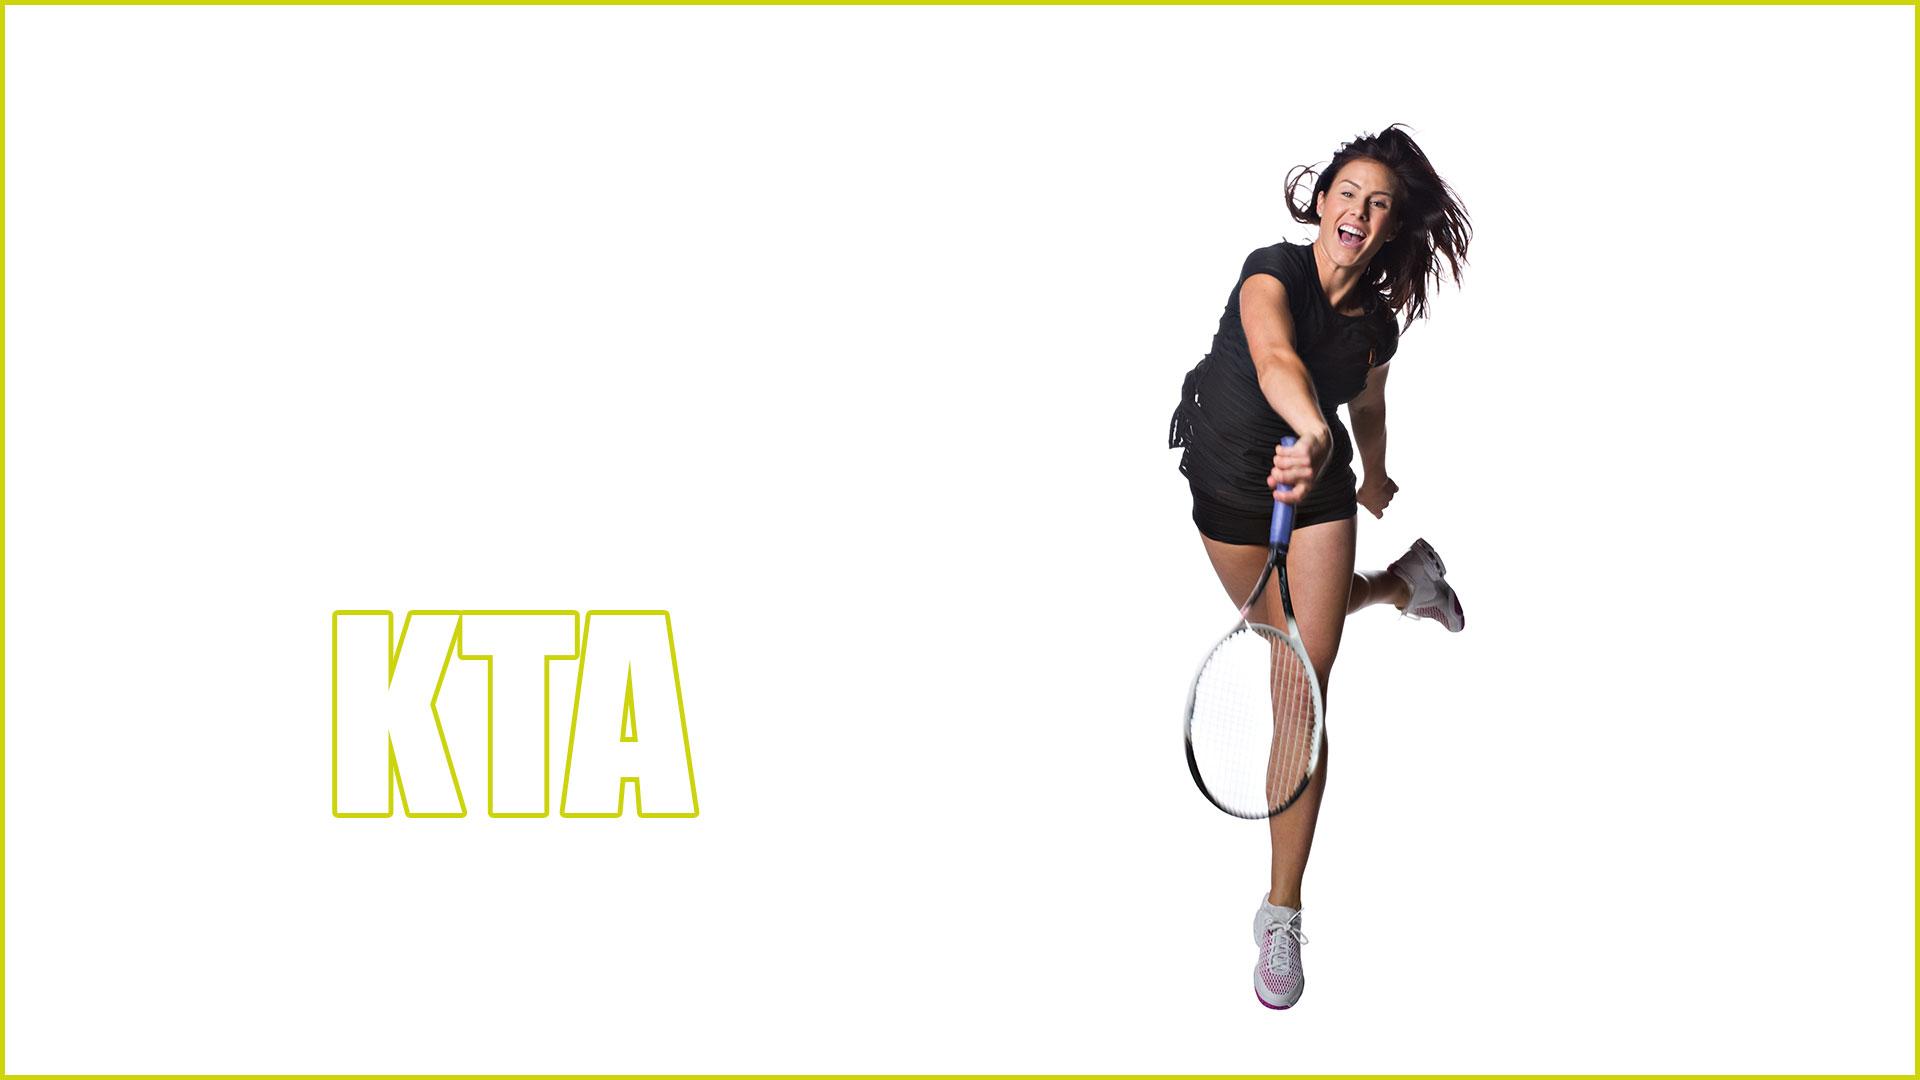 KTA Player